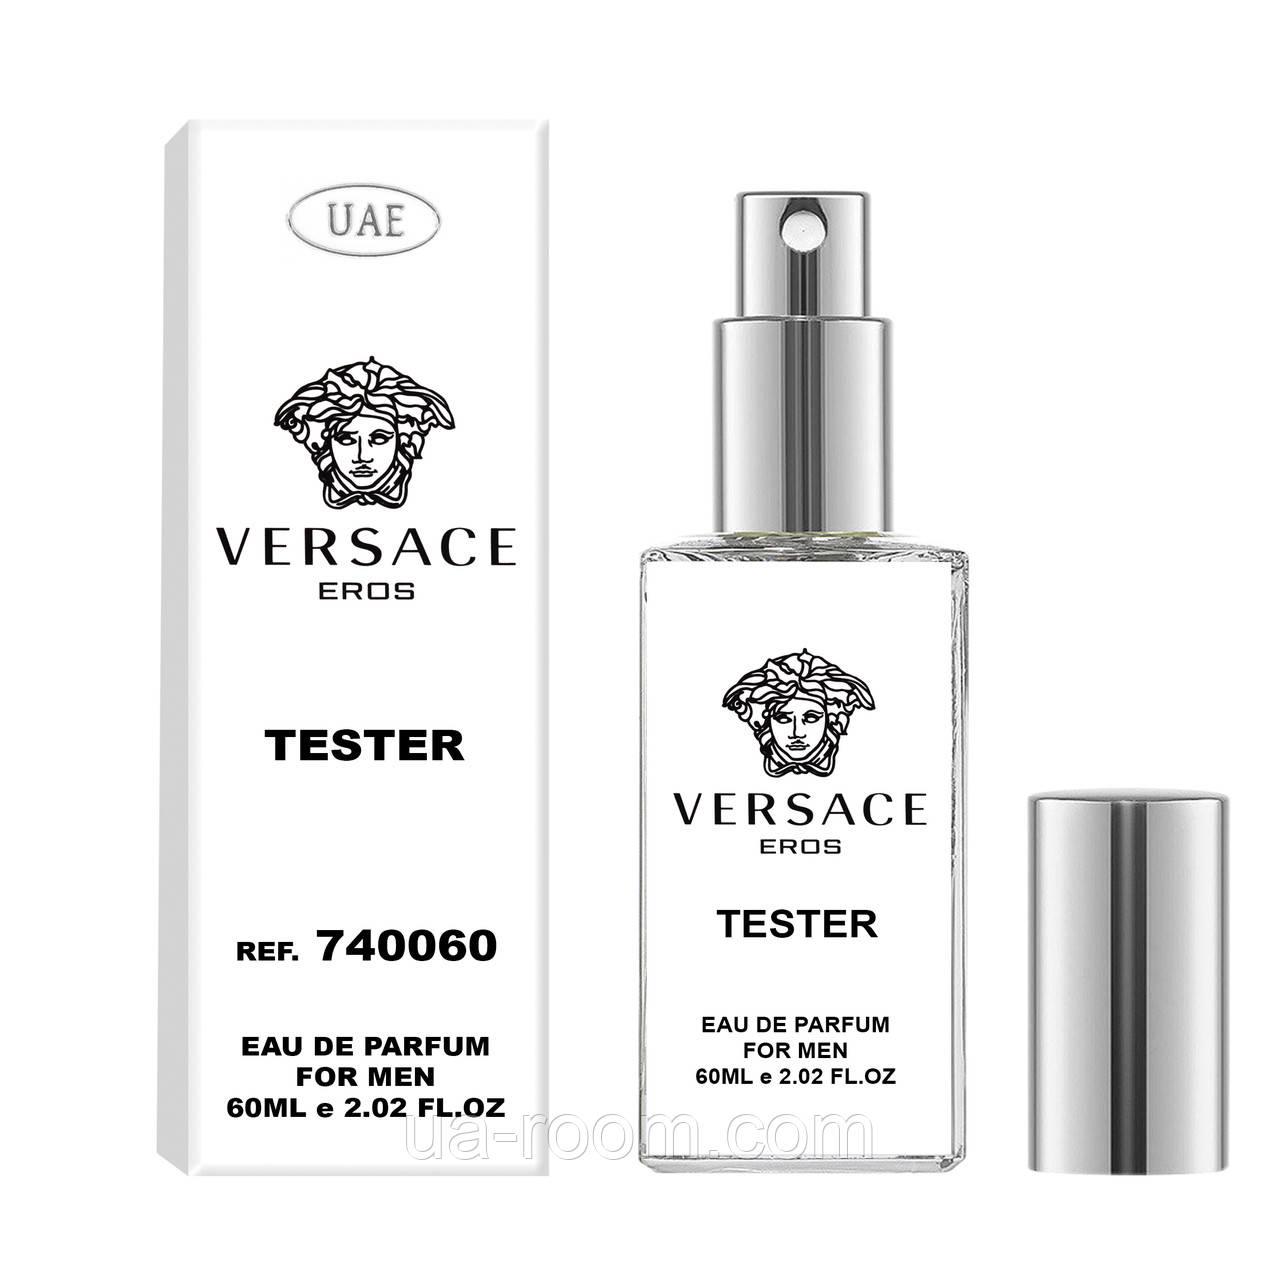 Тестер мужской UAE Versace Eros, 60 мл.